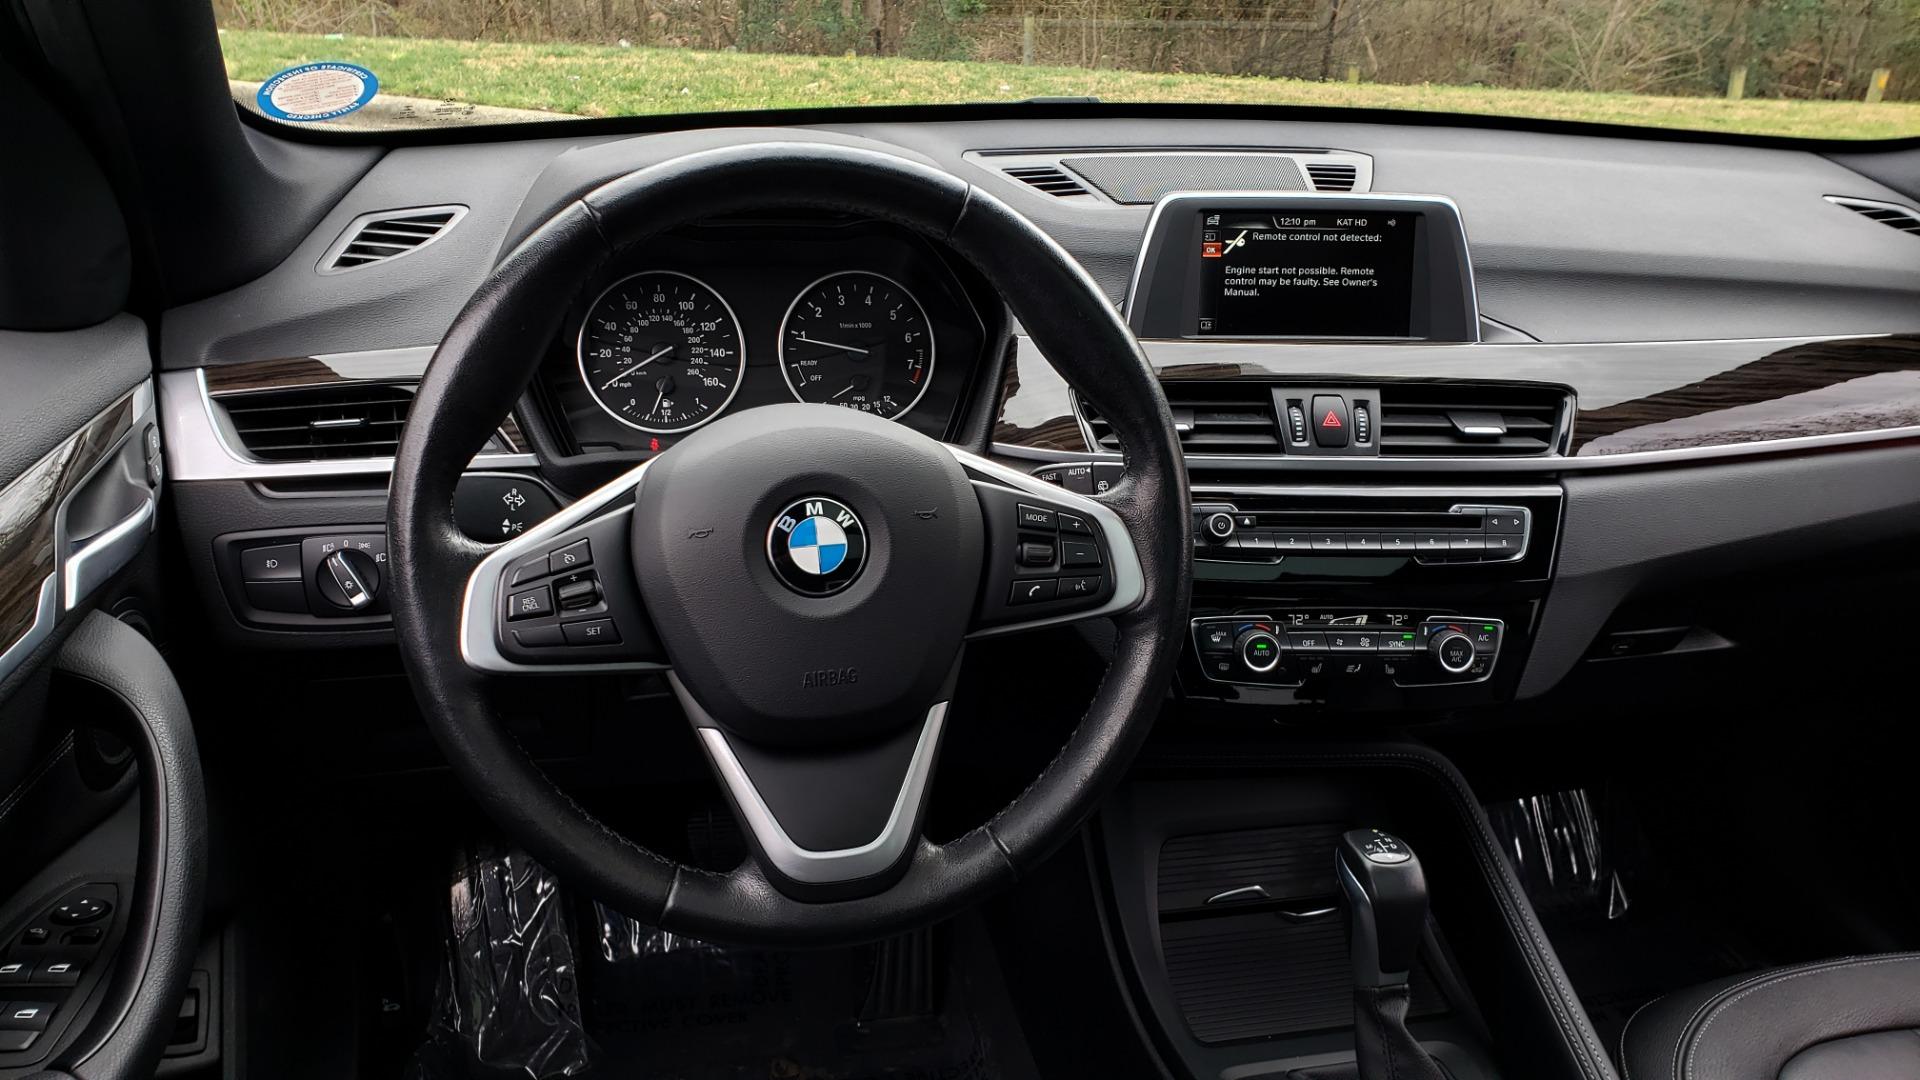 Used 2017 BMW X1 XDRIVE28I / PREM PKG / DRIVER ASST / NAV / CLD WTHR for sale Sold at Formula Imports in Charlotte NC 28227 39